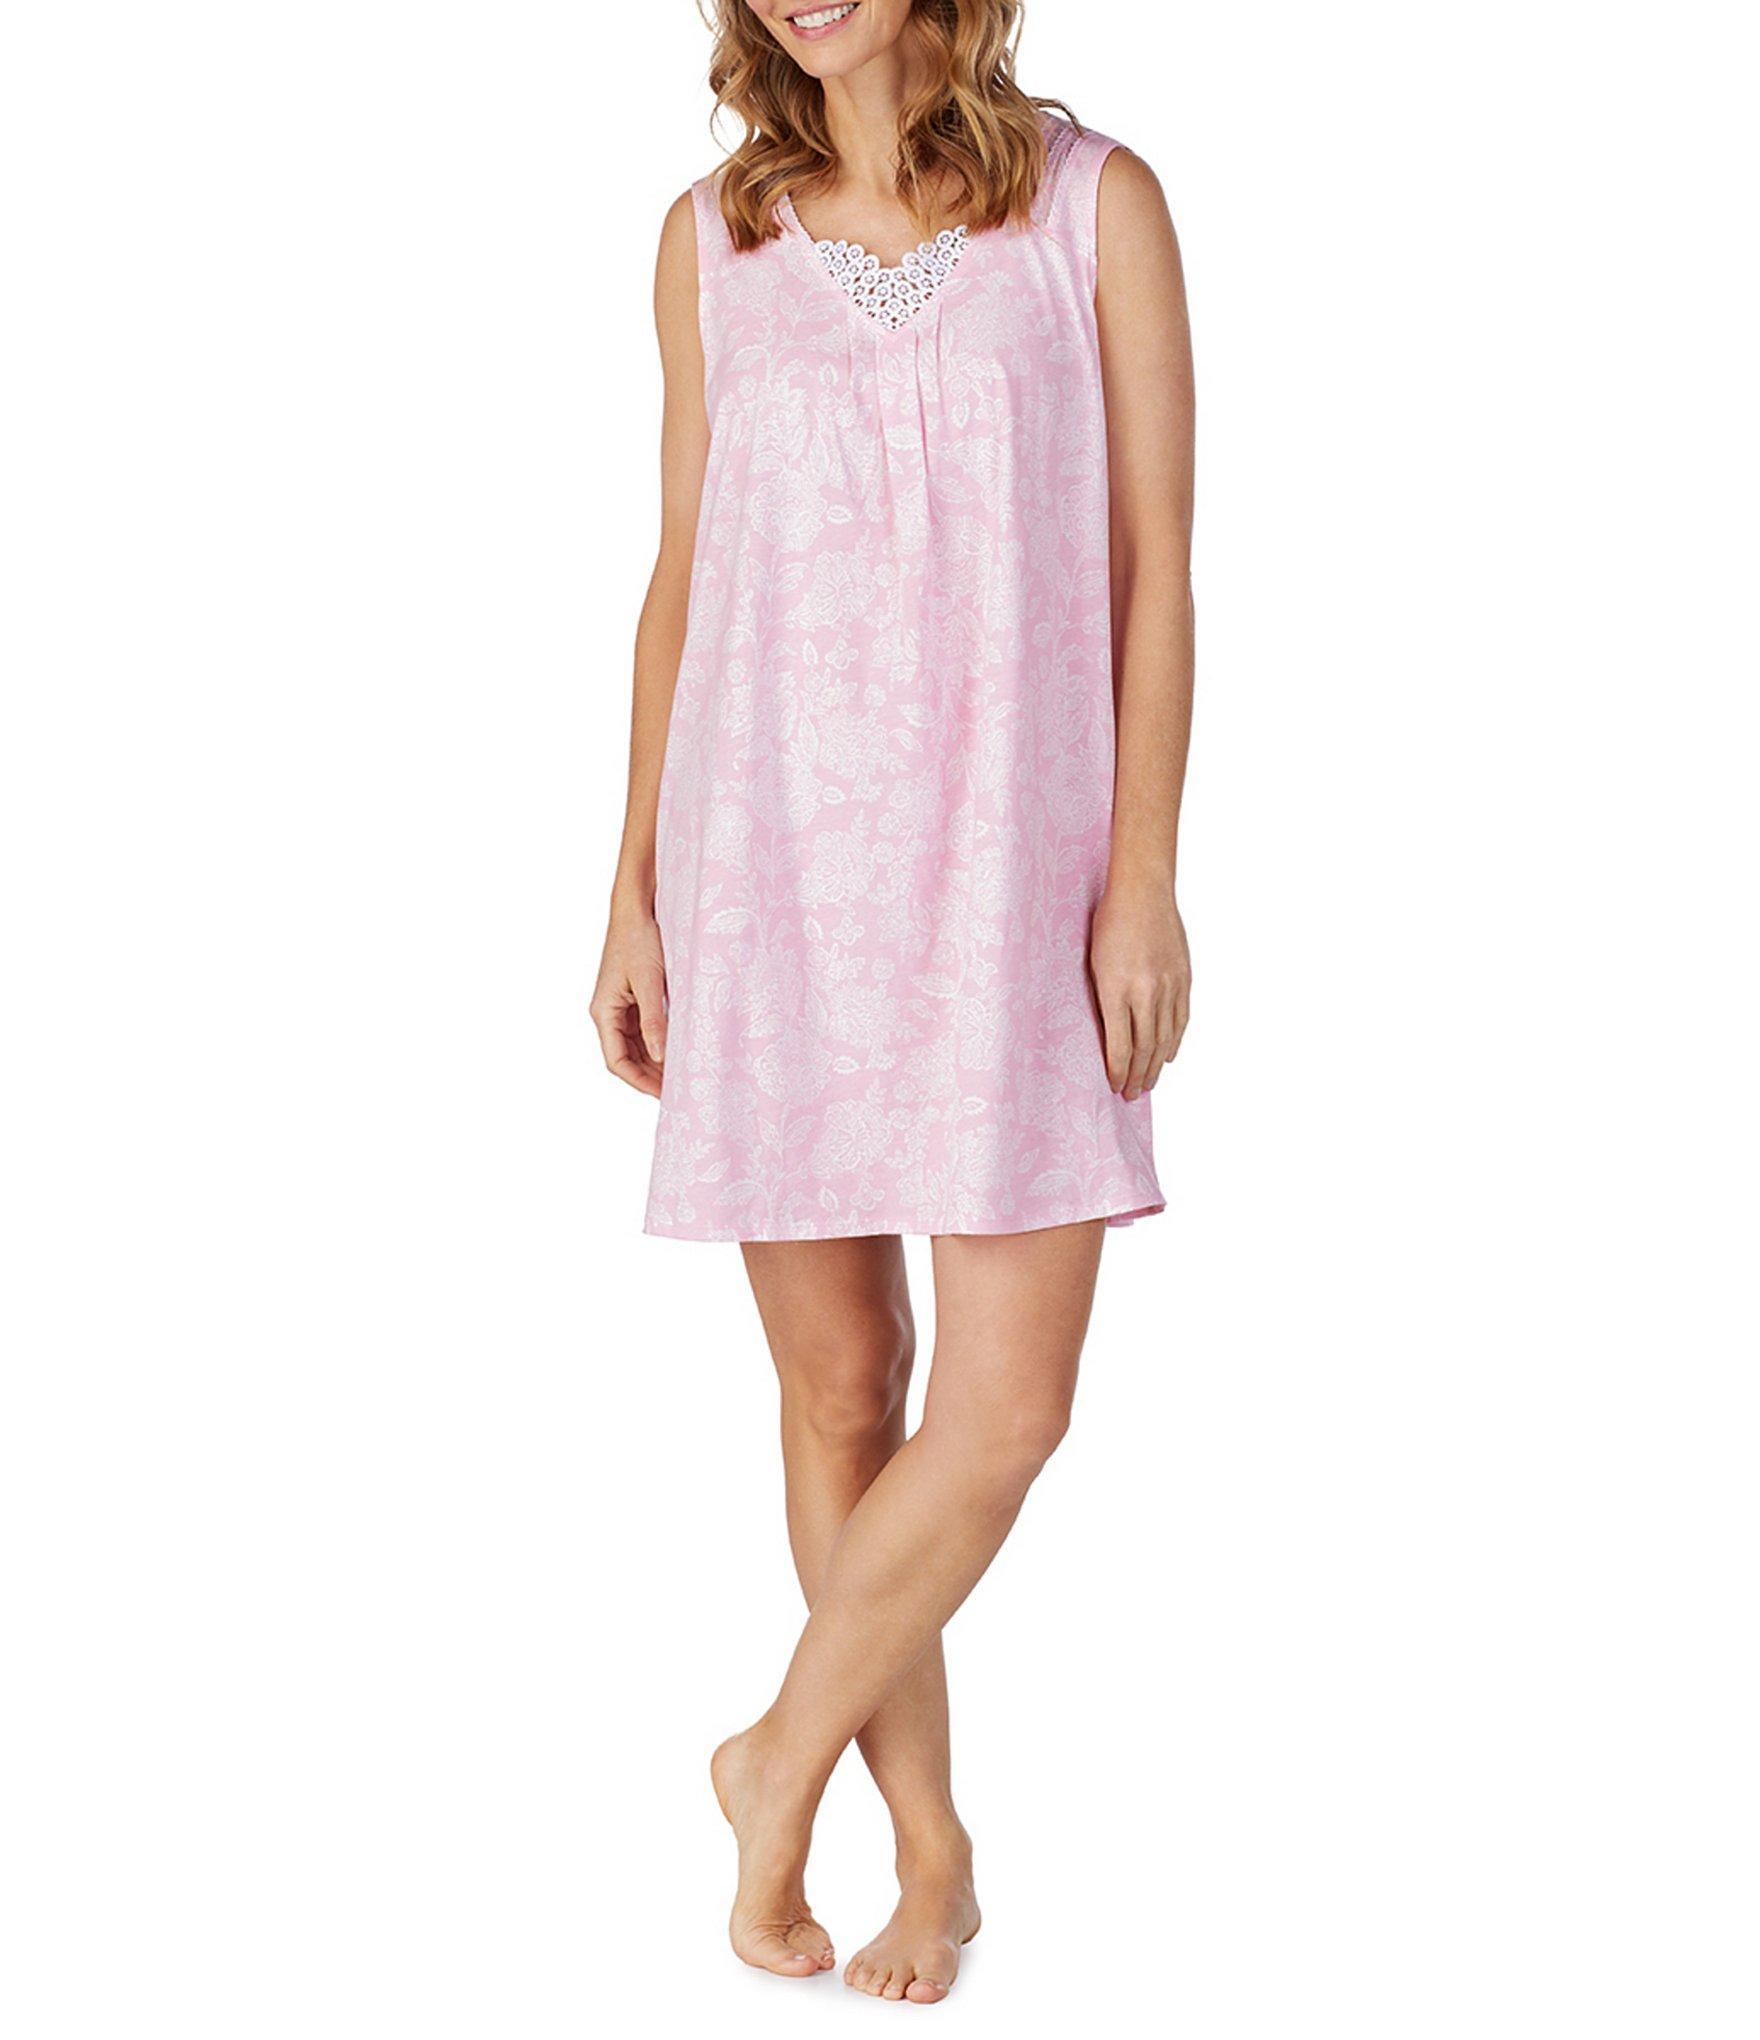 c3db9fbce9 Carole Hochman - Pink Damask-printed Jersey Knit Short Gown - Lyst. View  fullscreen